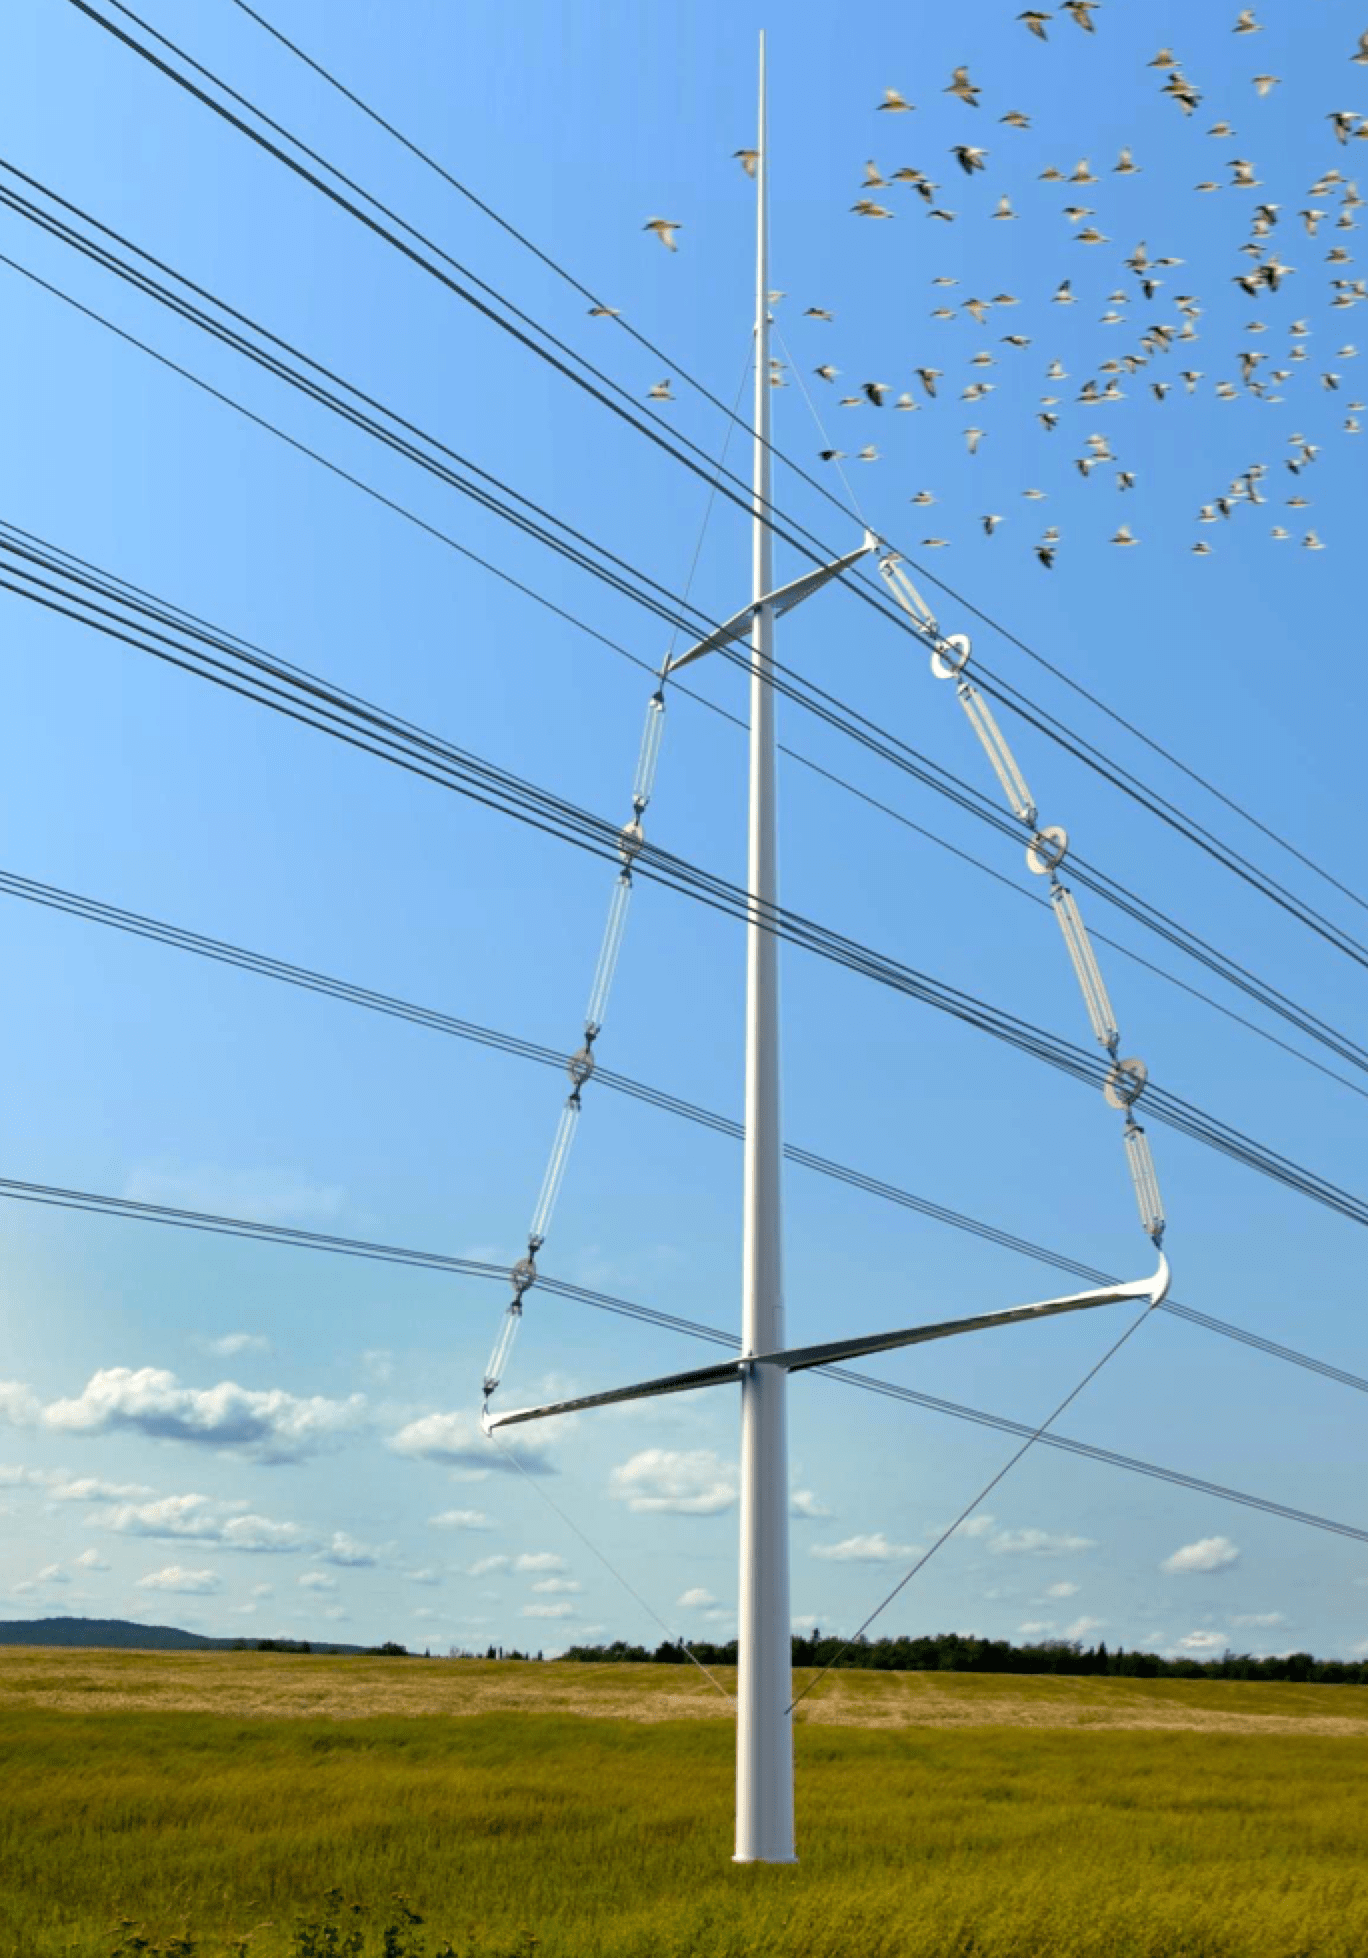 screen-shot-2016-10-21-at-12-33-38 power line Toward More Aesthetic Power Lines Screen Shot 2016 10 21 at 12